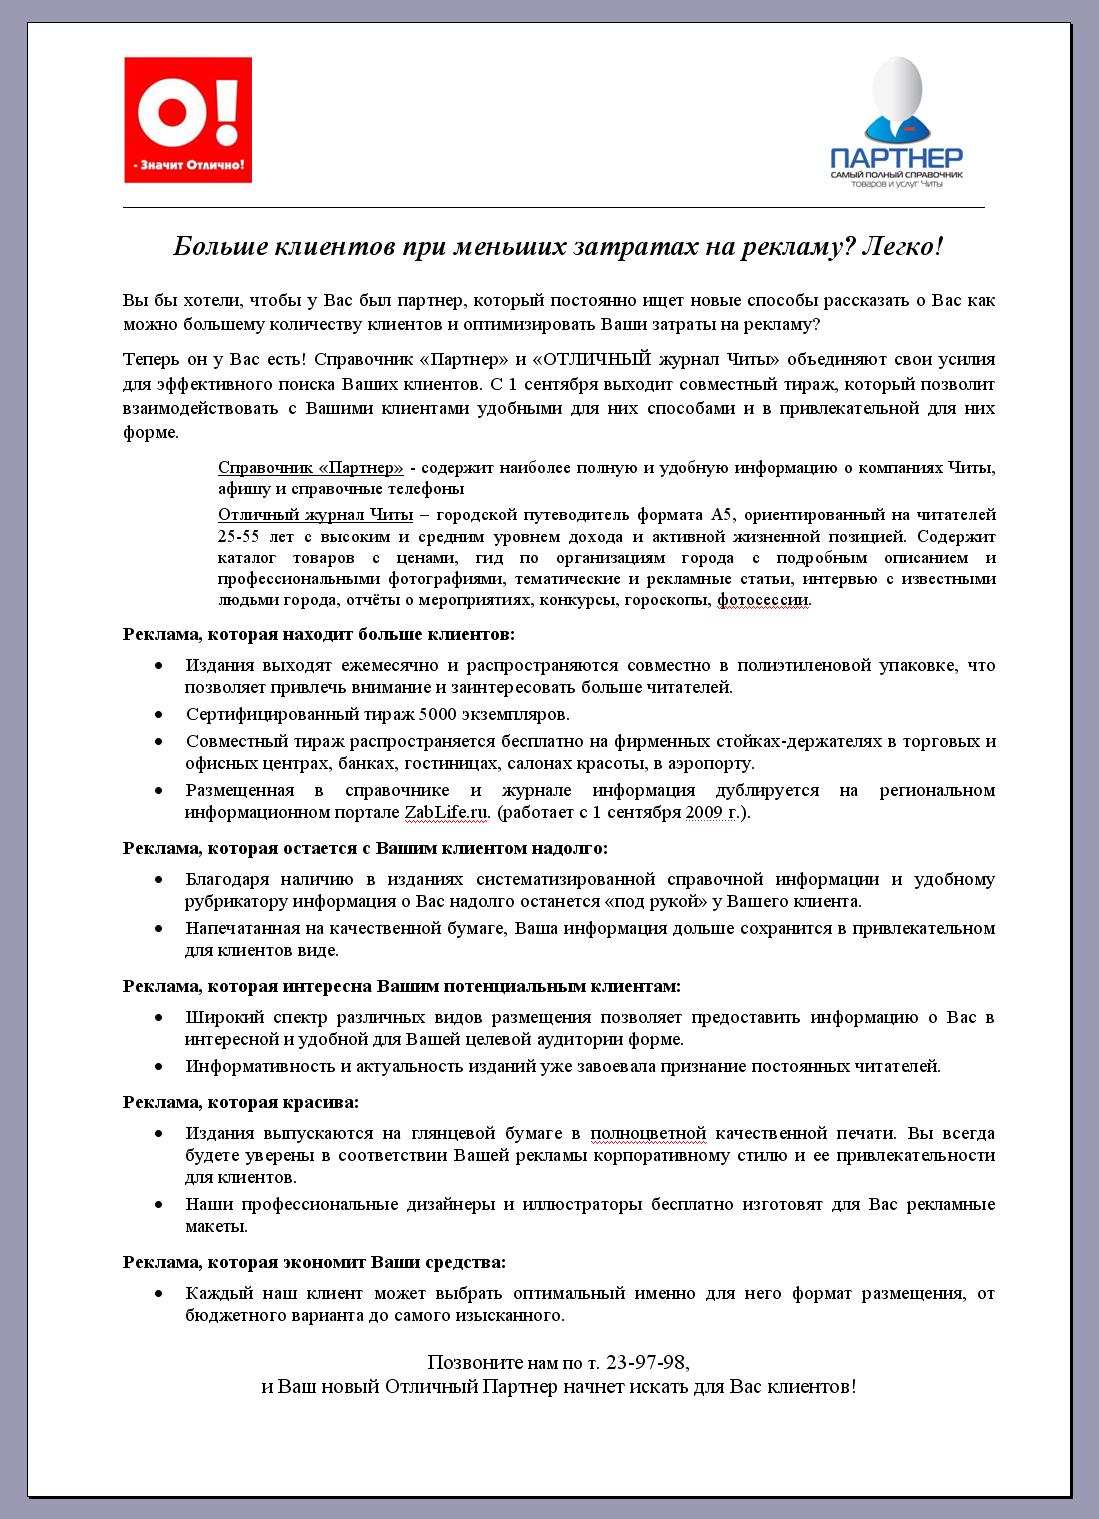 Коммерческое предложение Заблайф v2